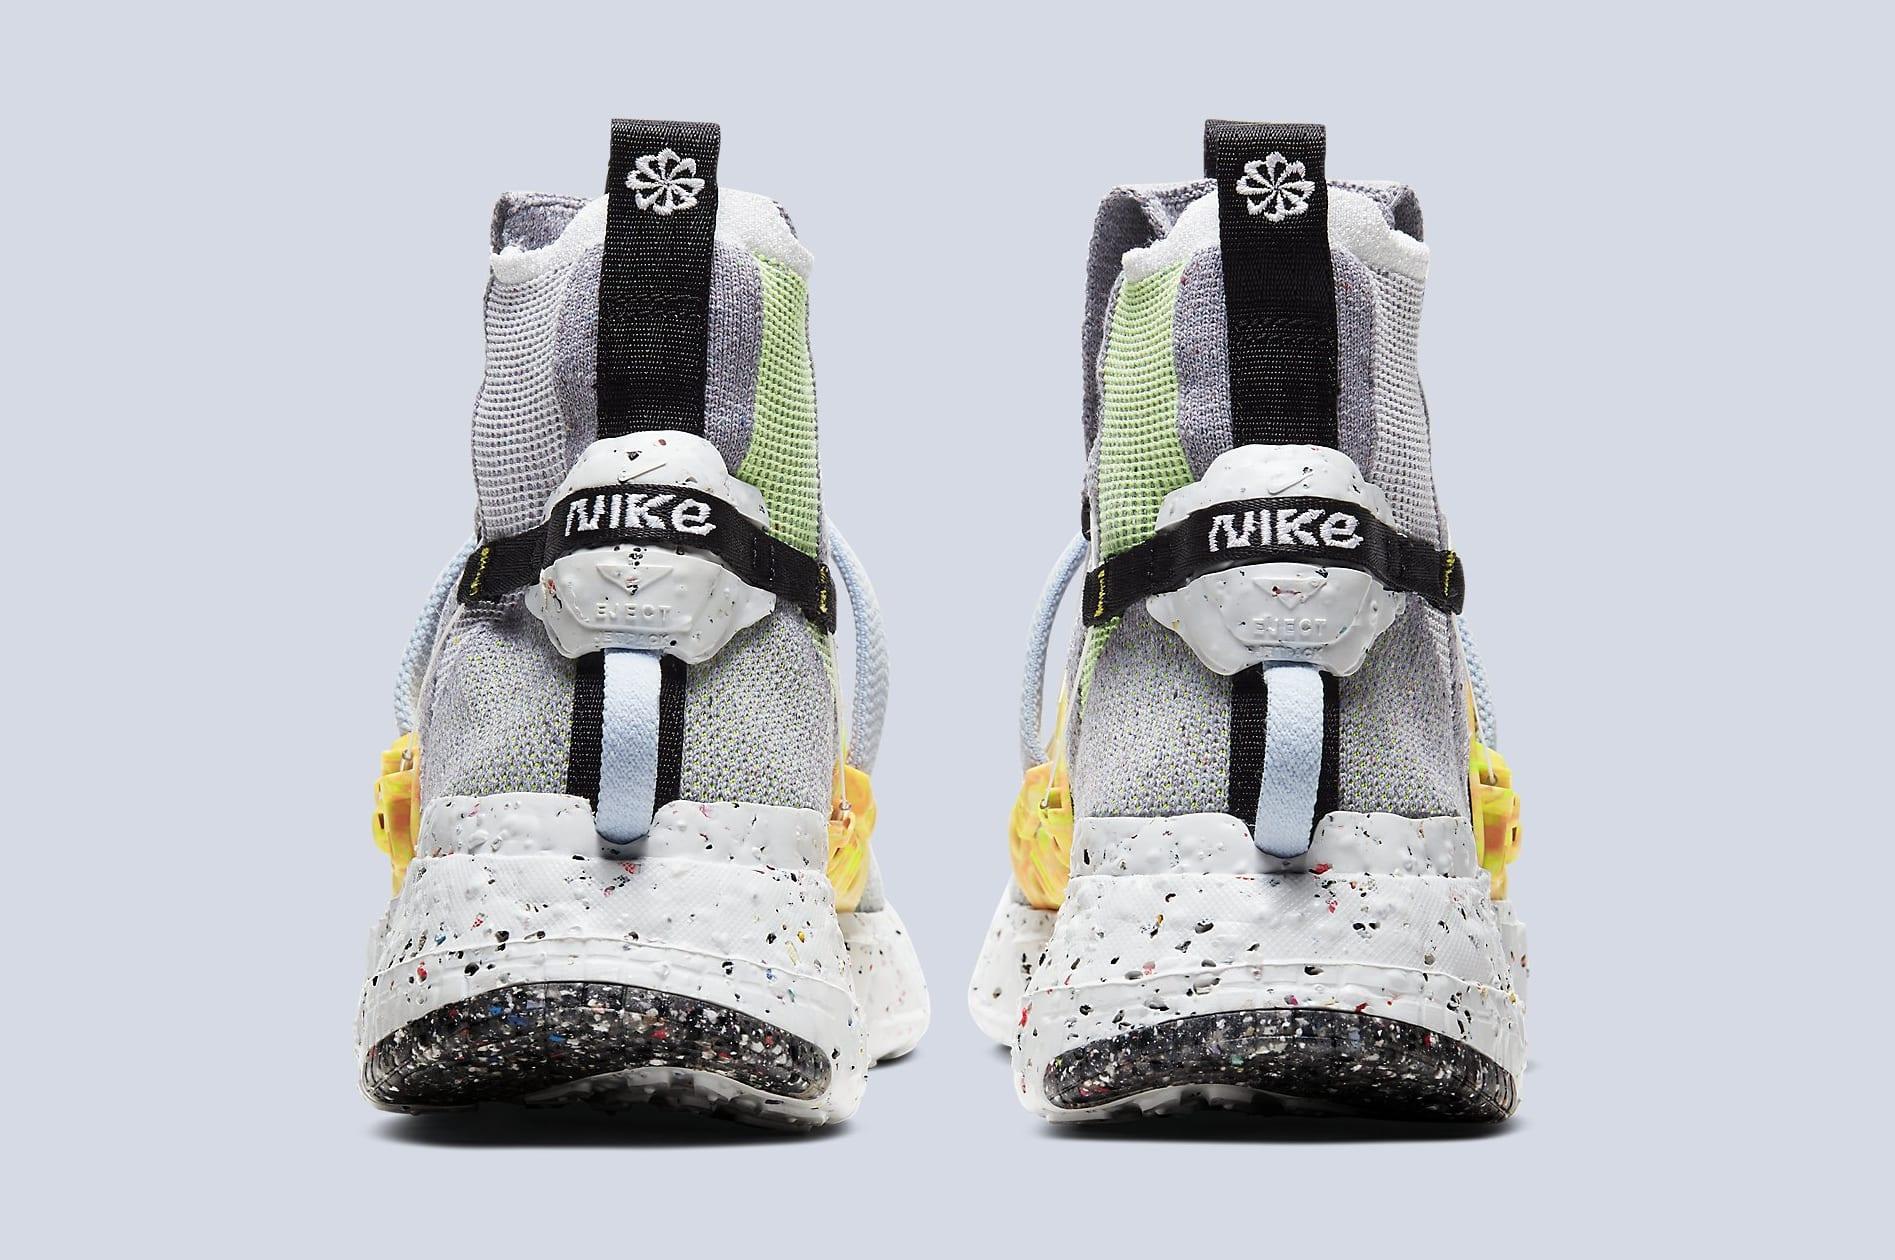 Nike Space Hippie 03 'Grey/Volt' CQ3989-002 Heel